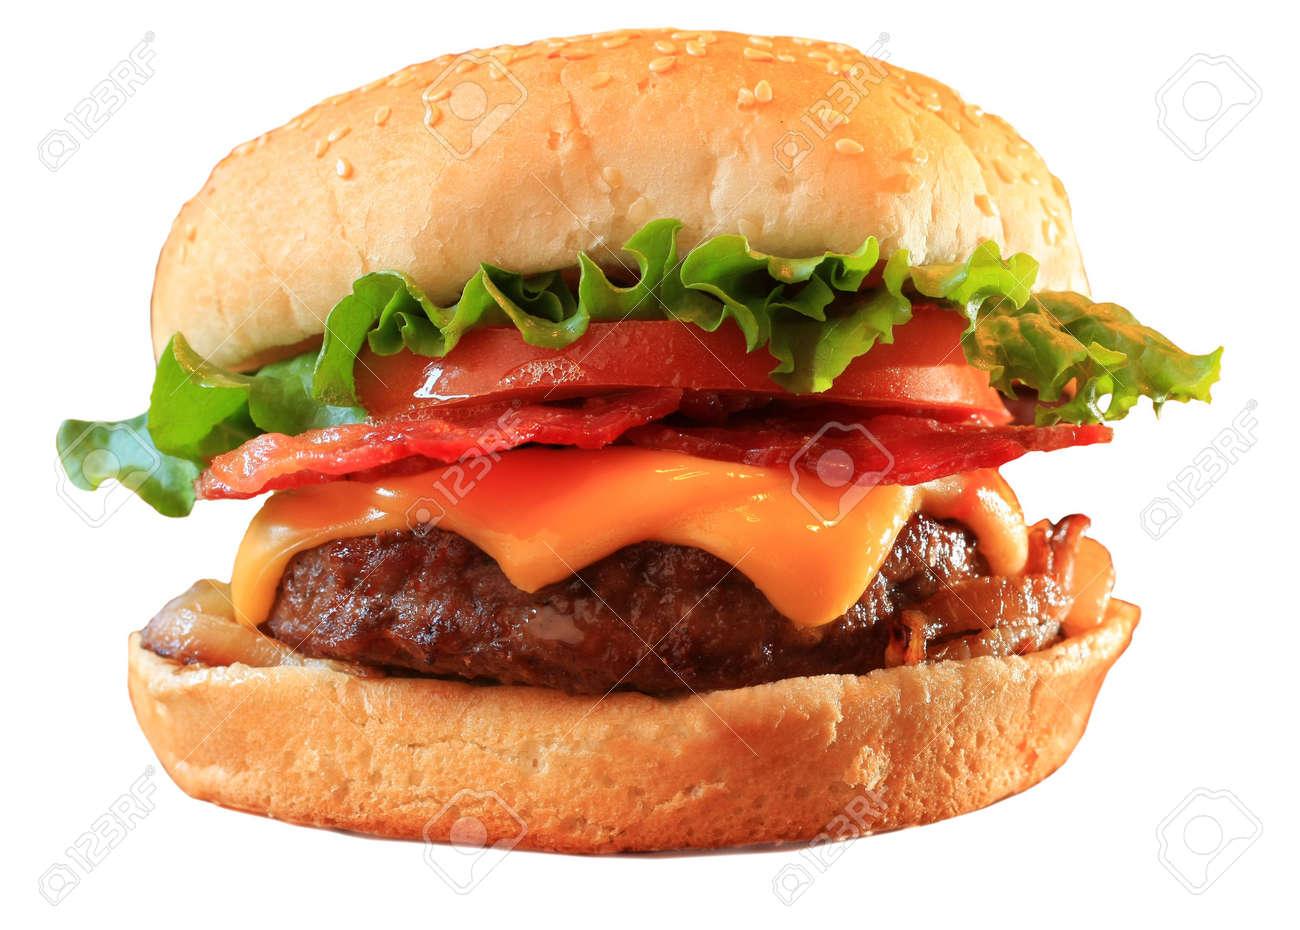 Bacon cheeseburger, isolated on white. Stock Photo - 3355653